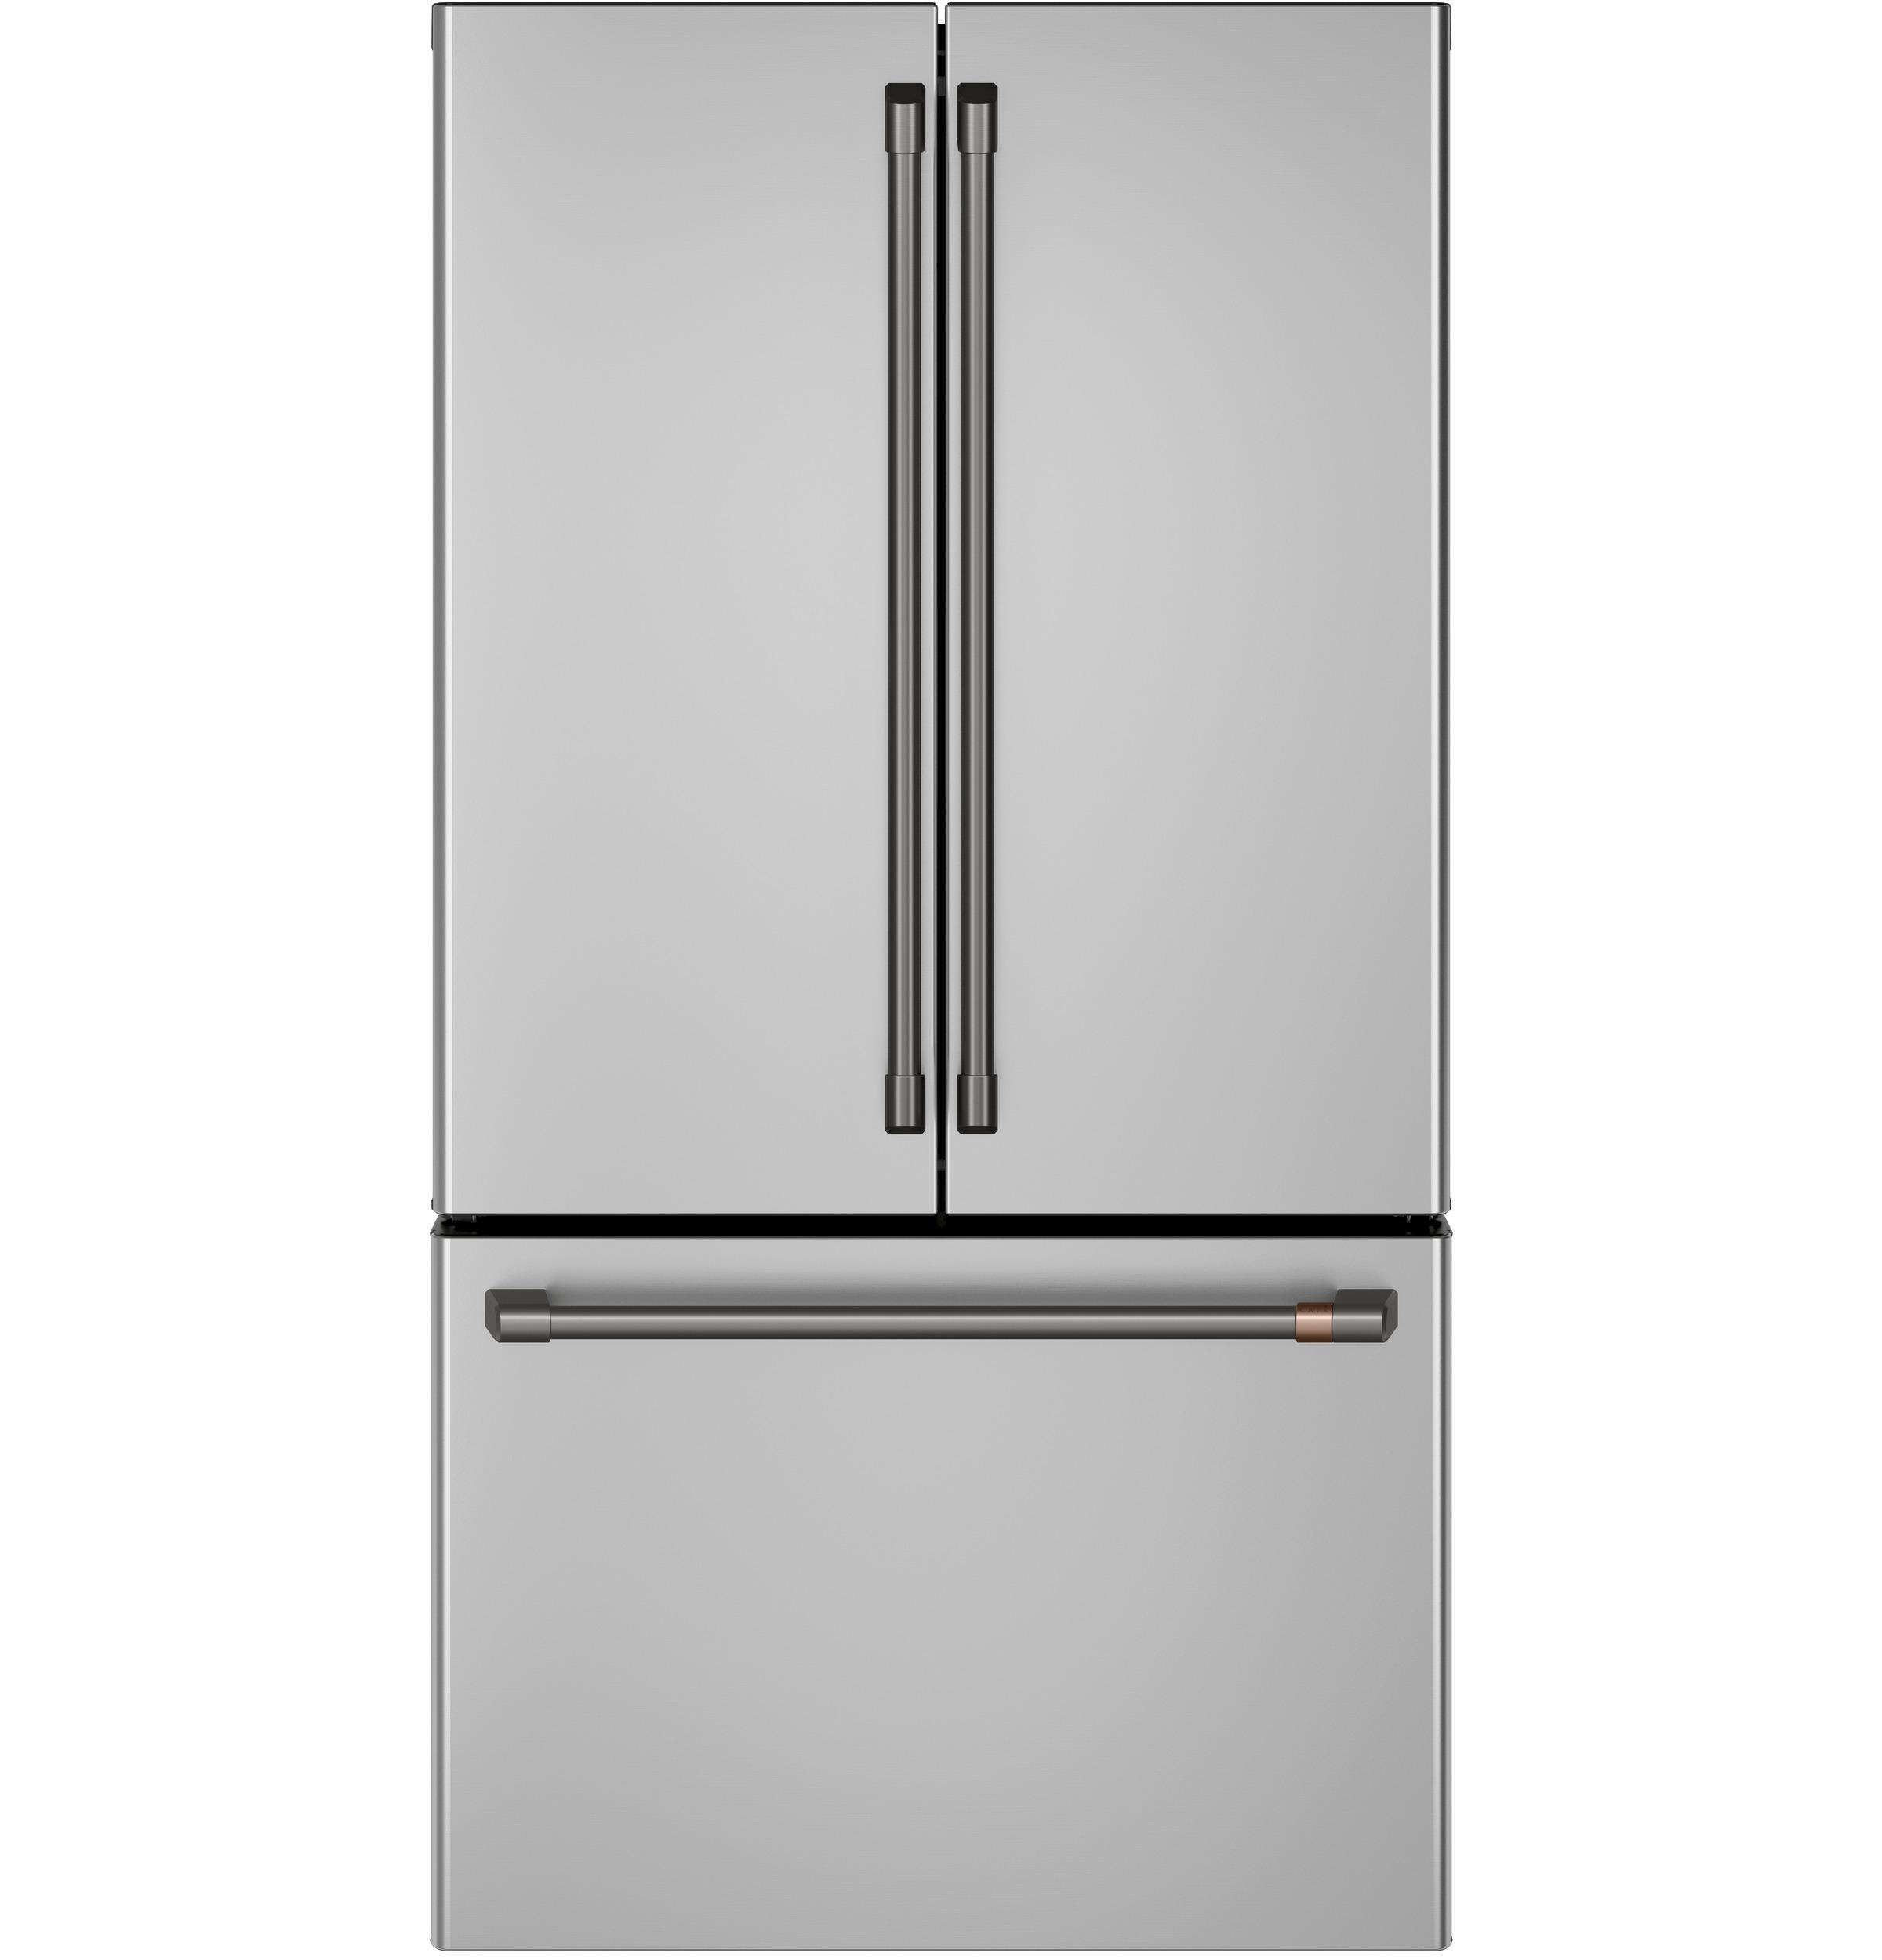 Model: CWE23SP2MS1 | Café™ ENERGY STAR® 23.1 Cu. Ft. Counter-Depth French-Door Refrigerator